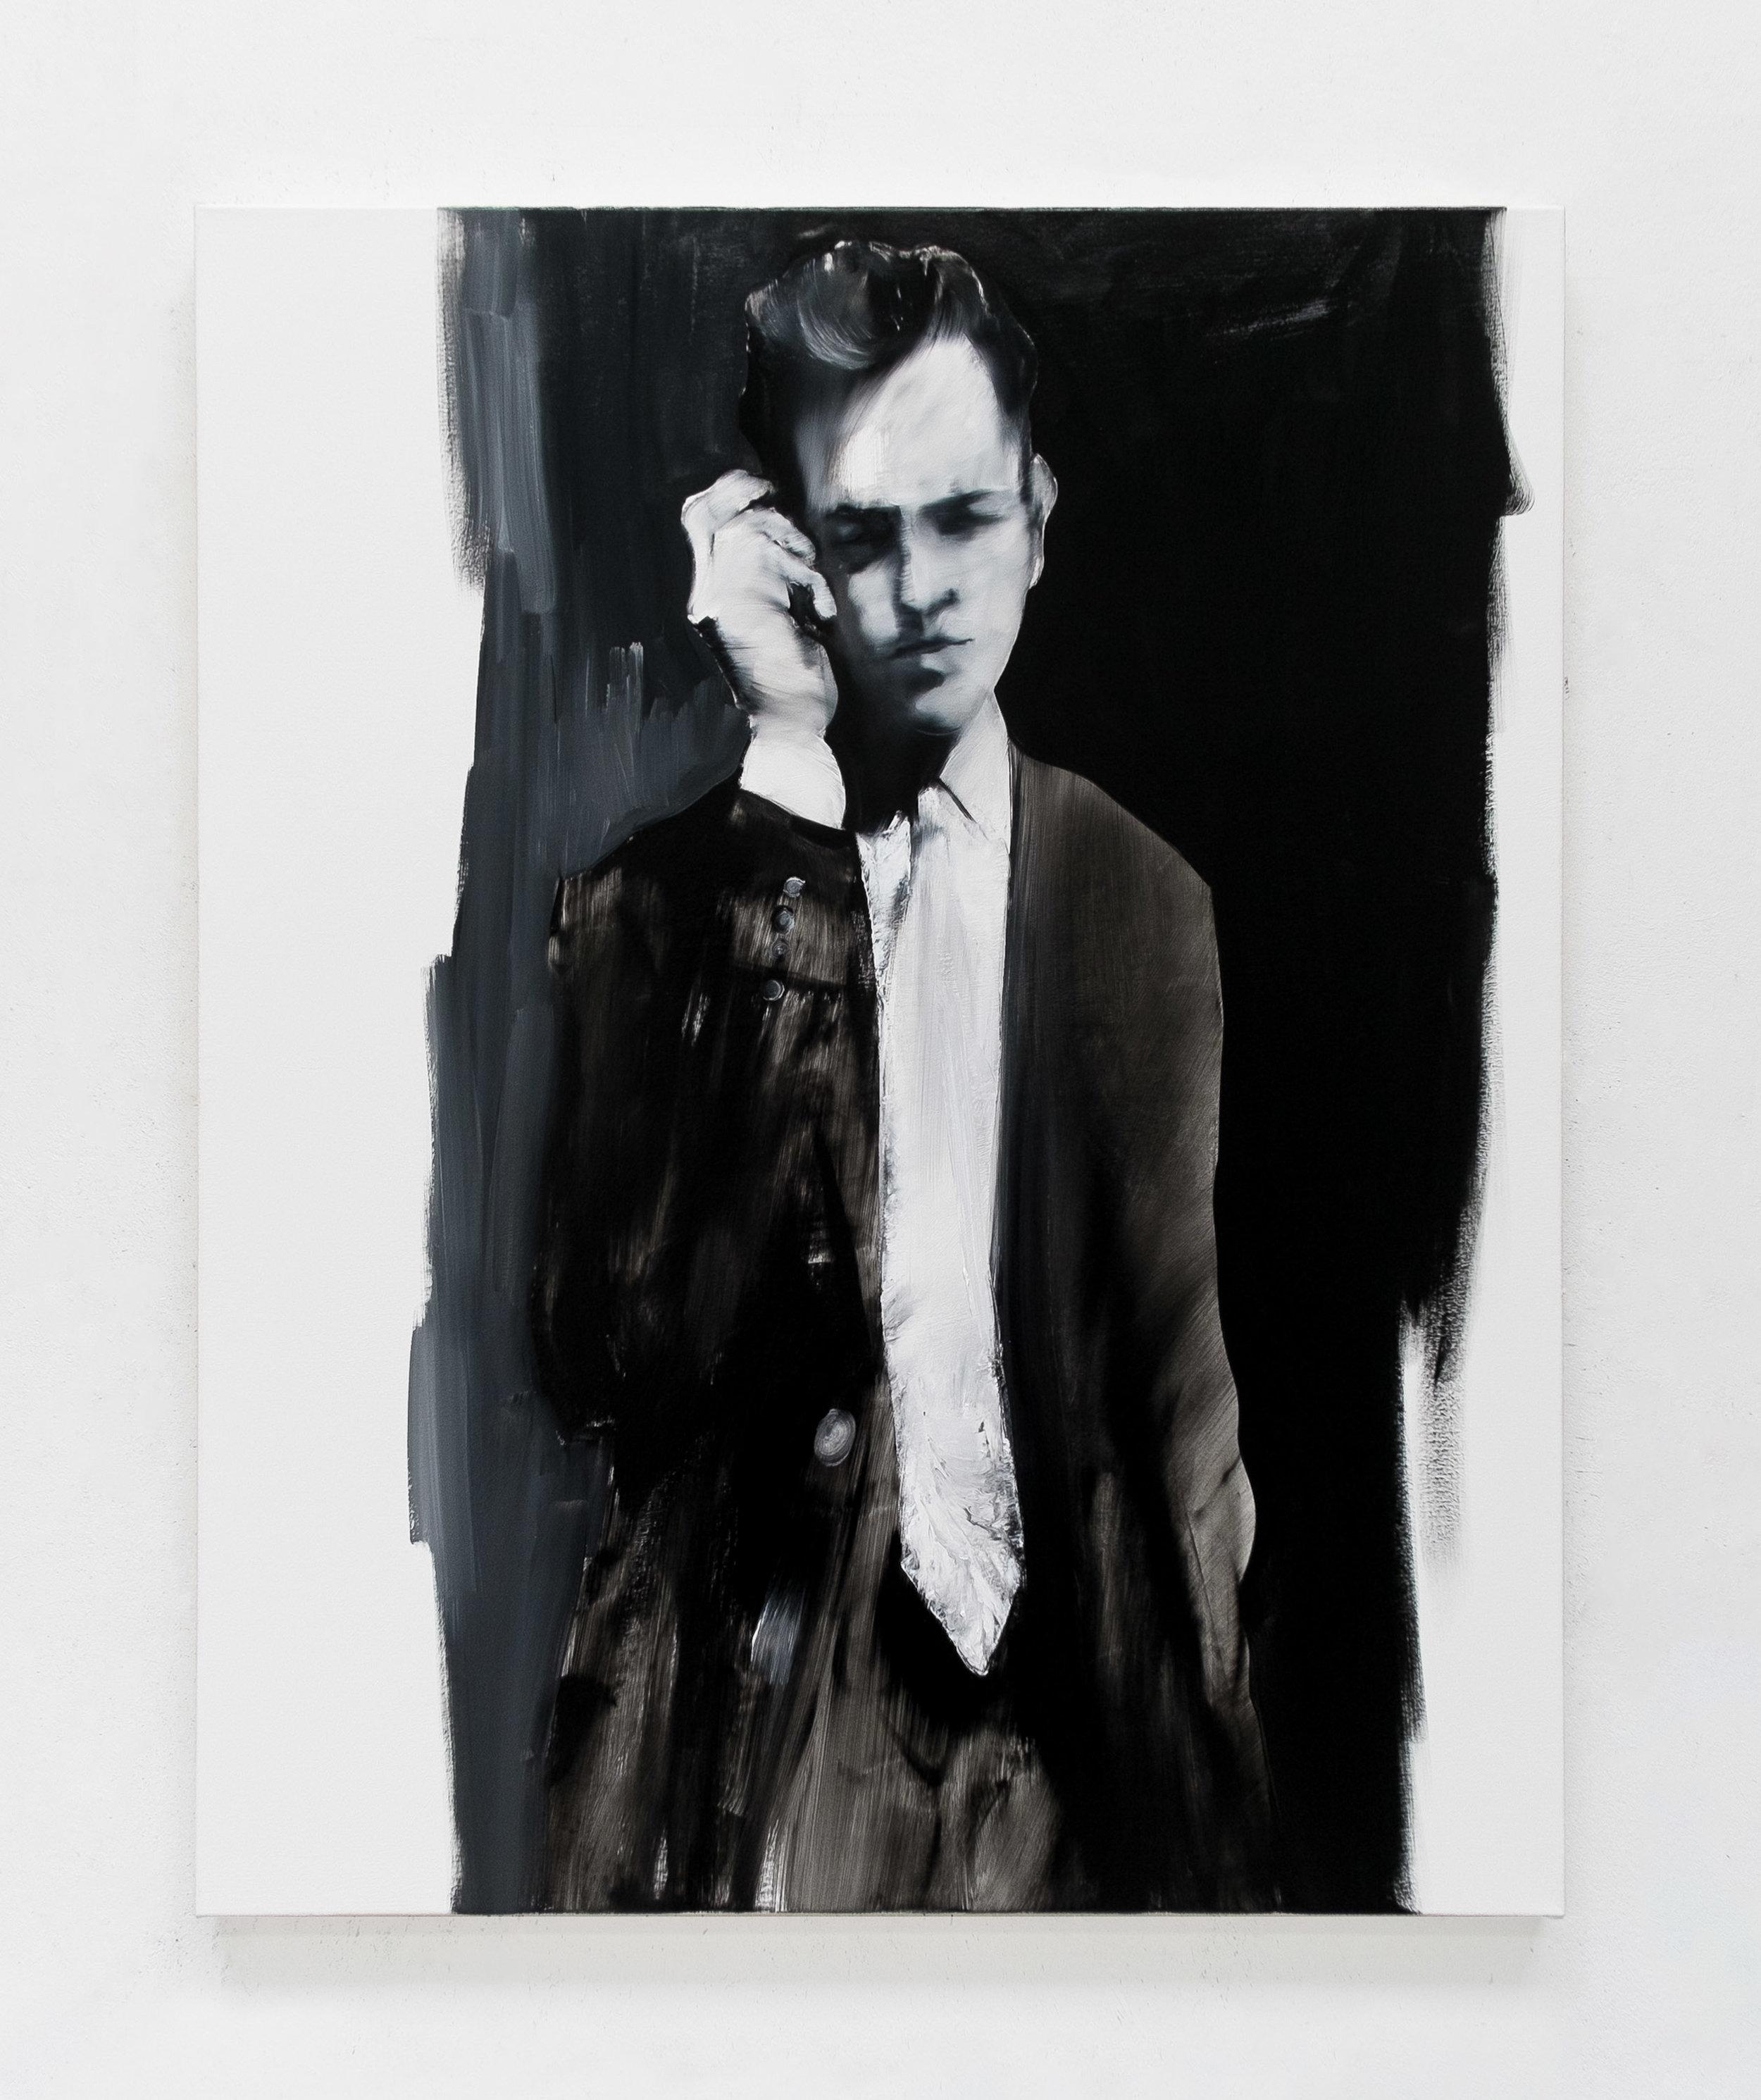 2019  Oil on canvas  100cm x 80cm